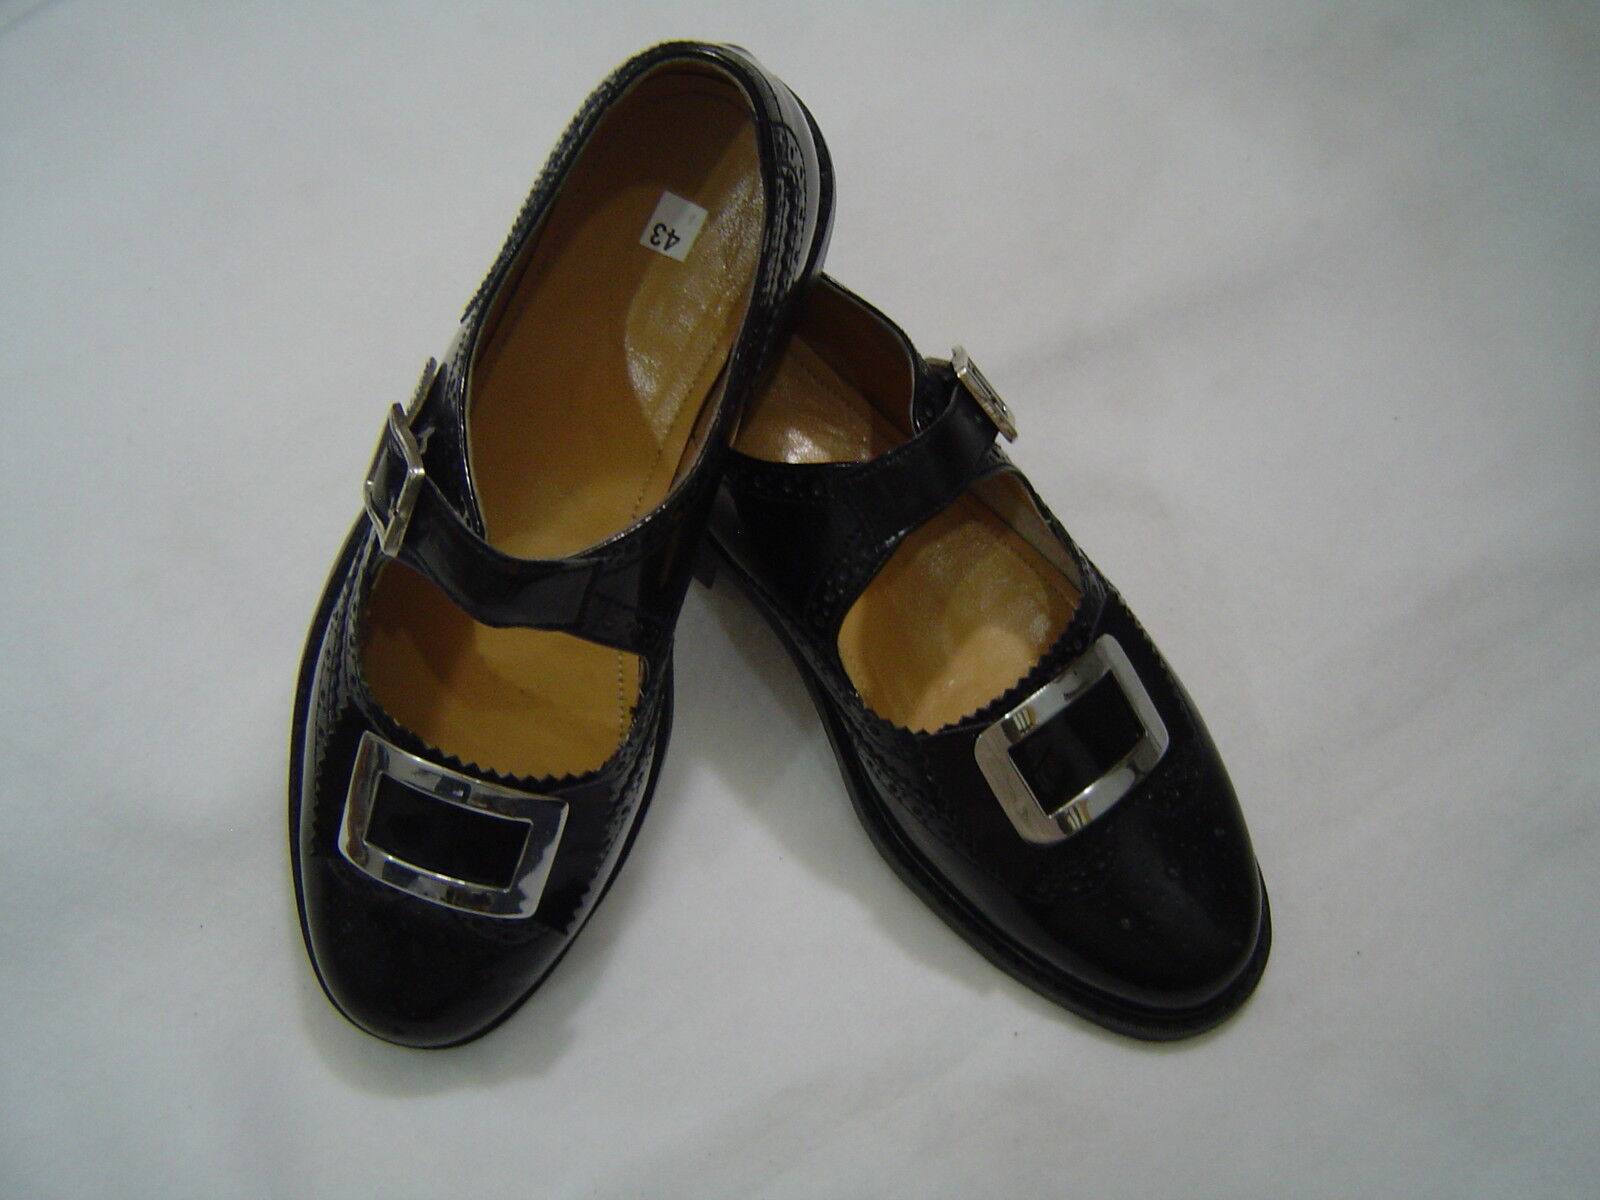 Scottish Dancing Socks Brogue Zapatos with Hose Socks Dancing 61bfa1